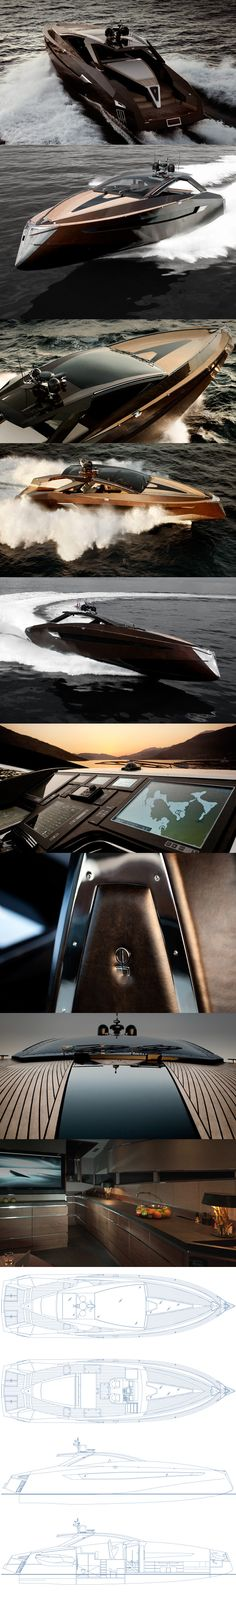 Art of Kinetik Hedonist #Yacht #luxury